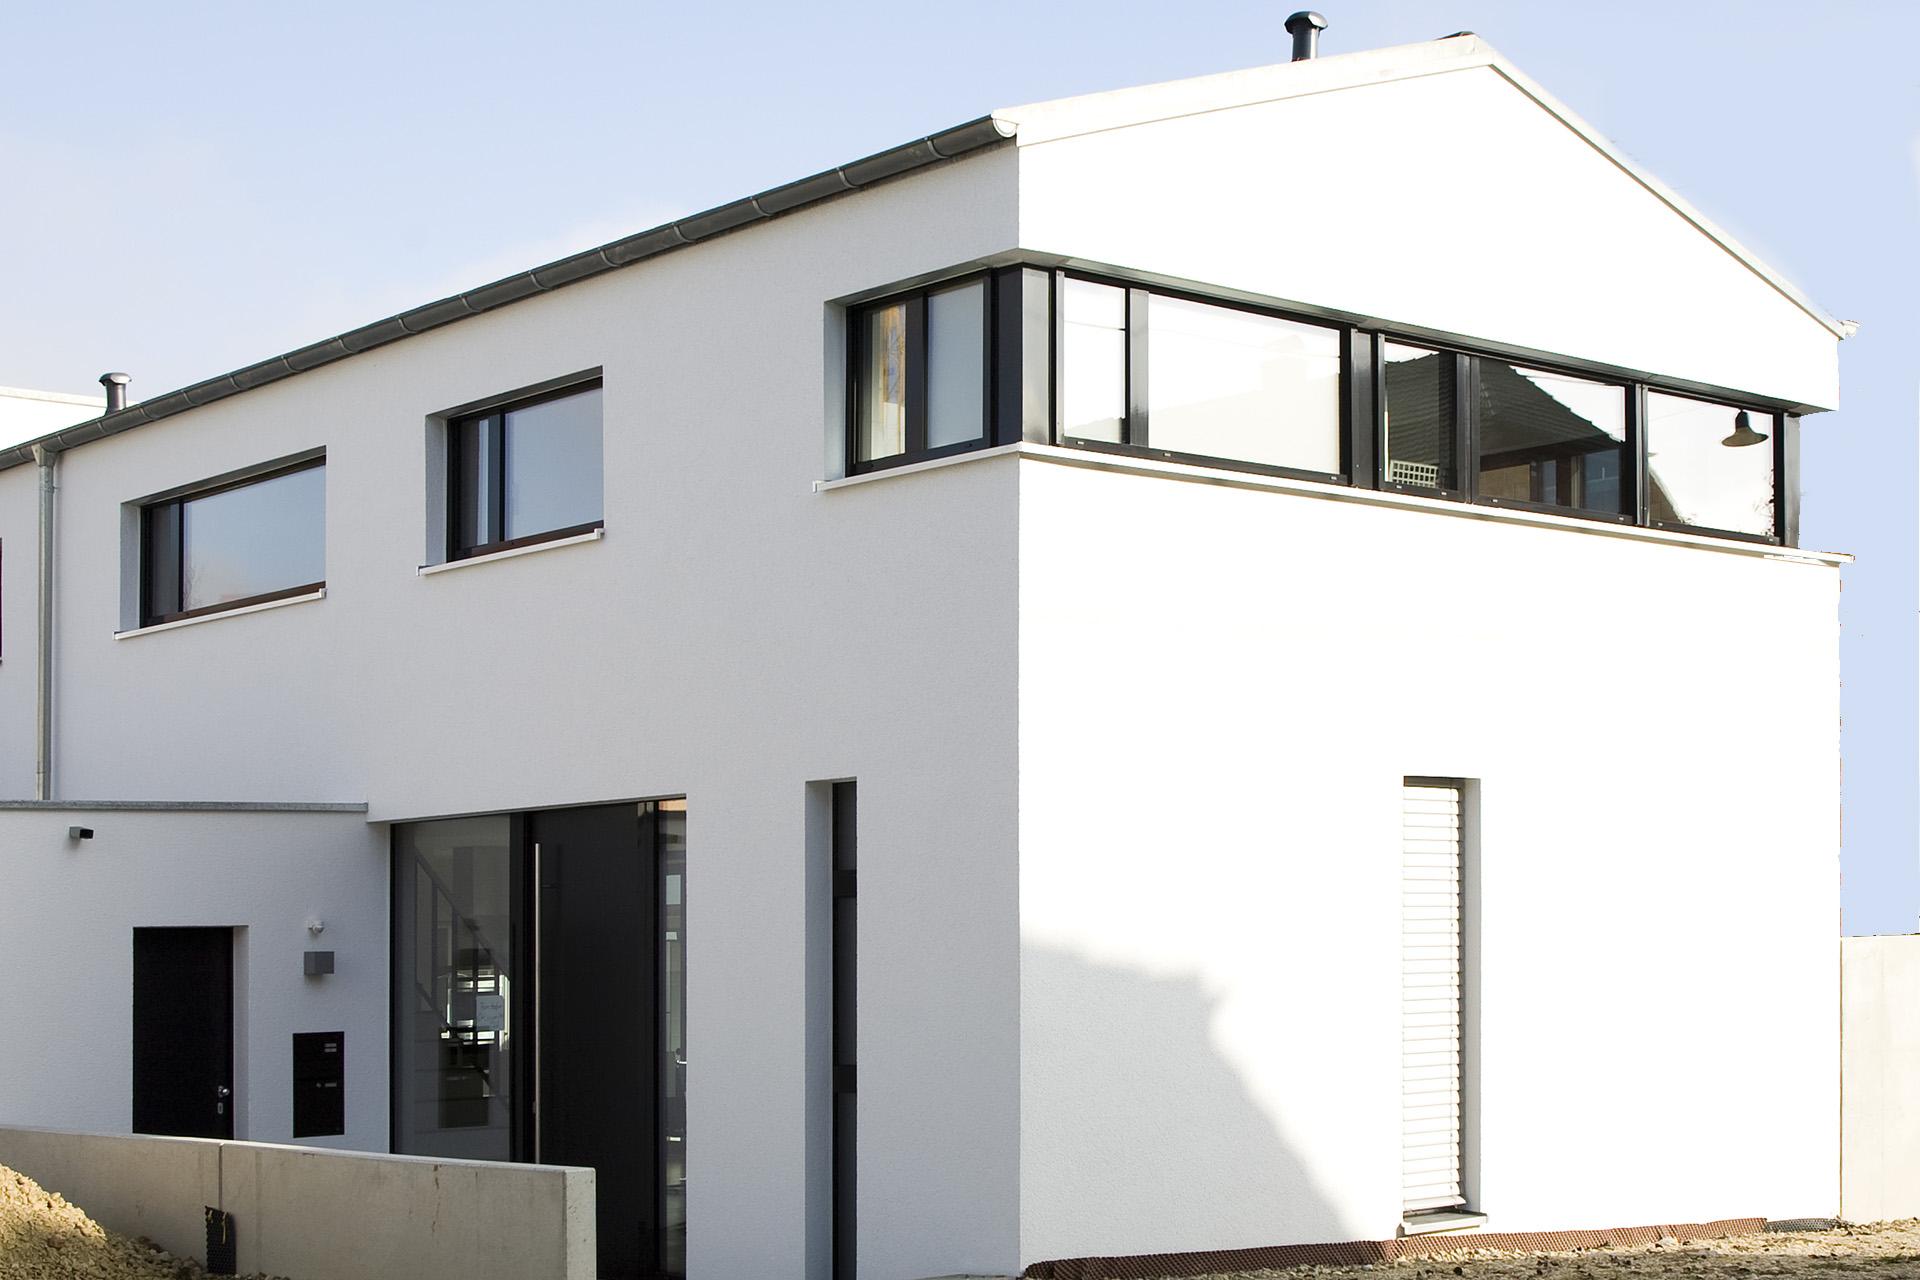 neubau einfamilienhaus h hrbbauwerk gbr. Black Bedroom Furniture Sets. Home Design Ideas